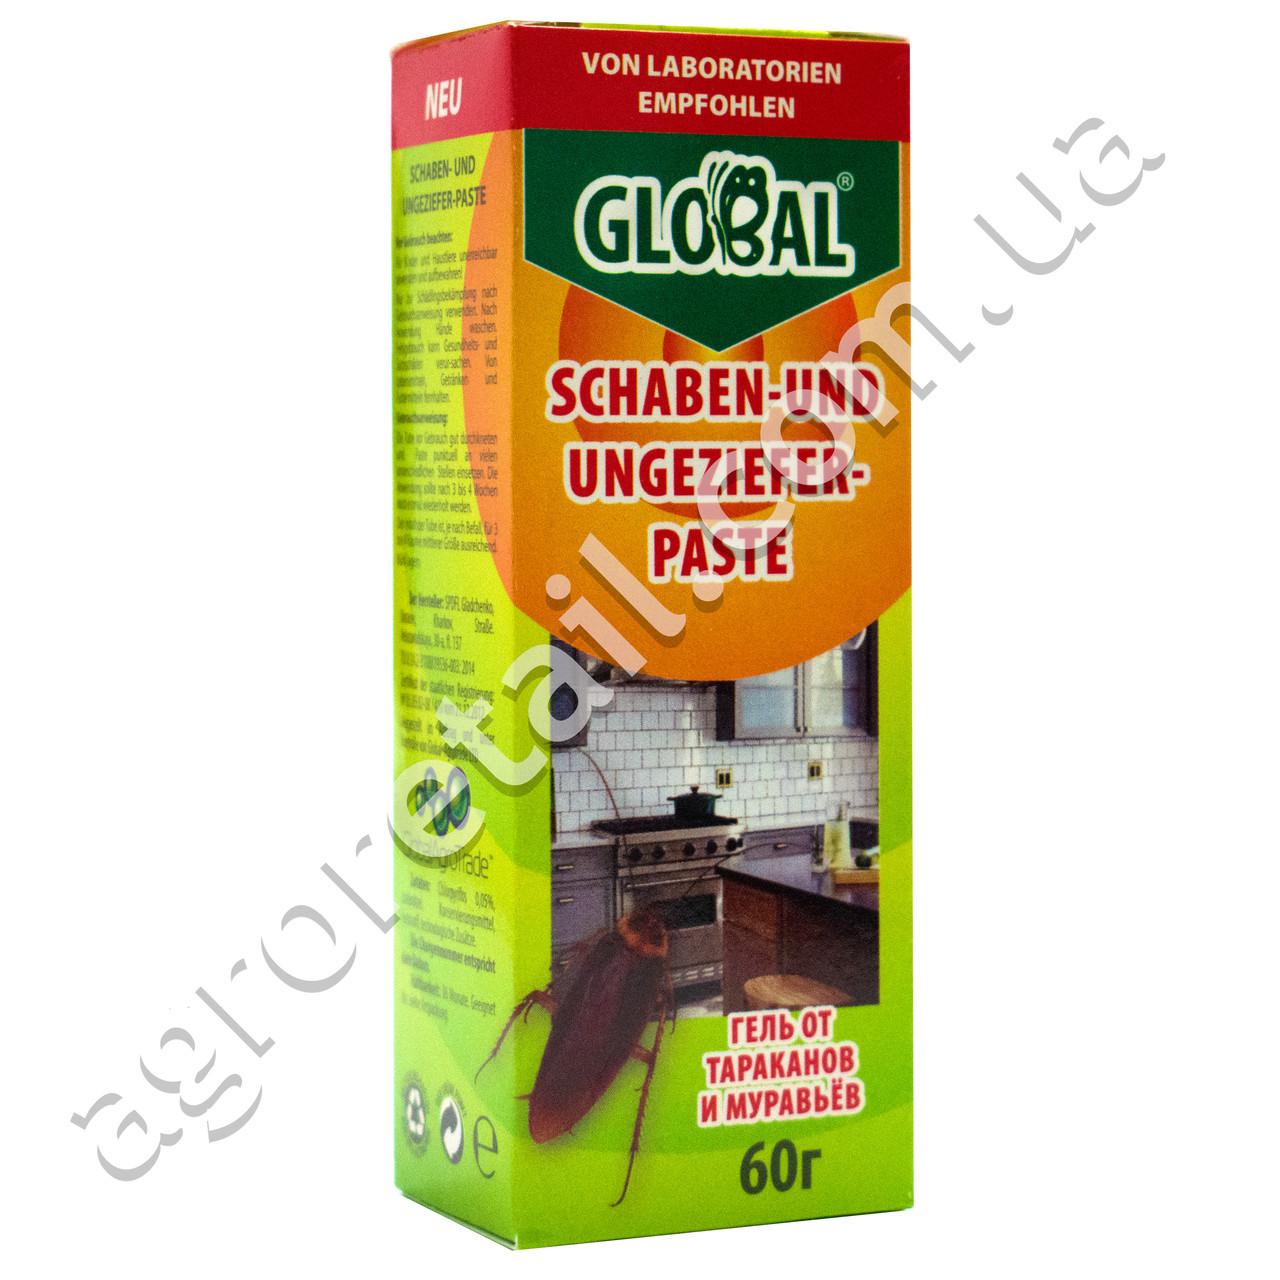 Гель от тараканов и муравьев Global 60 г